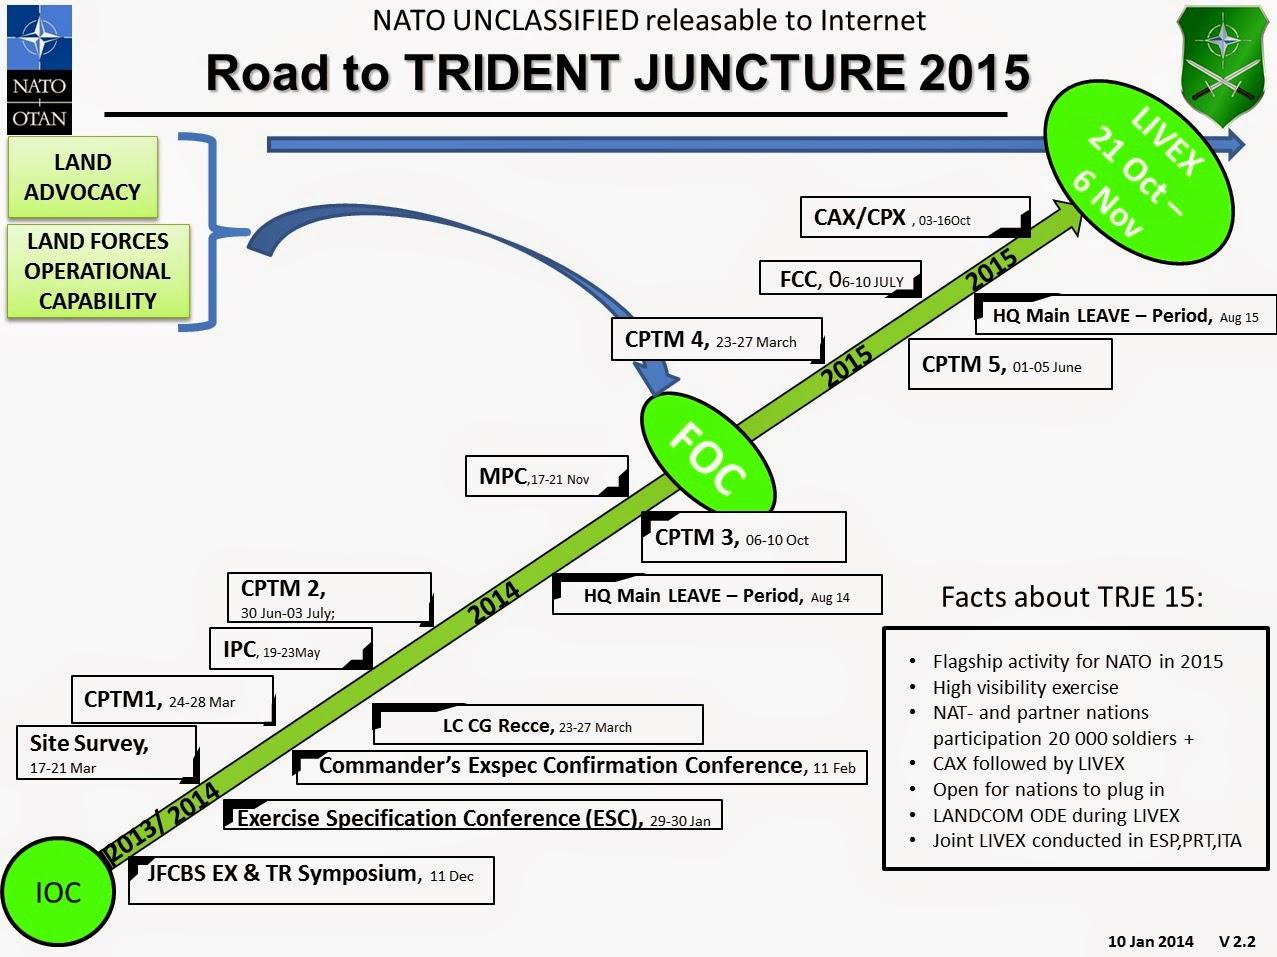 (A kép forrása: http://1.bp.blogspot.com/-W74oSlKbKHo/VFO-NRI1RGI/AAAAAAAAdPE/7OIPYKSlkiE/s1600/Trident_Juncture_2015.jpg)